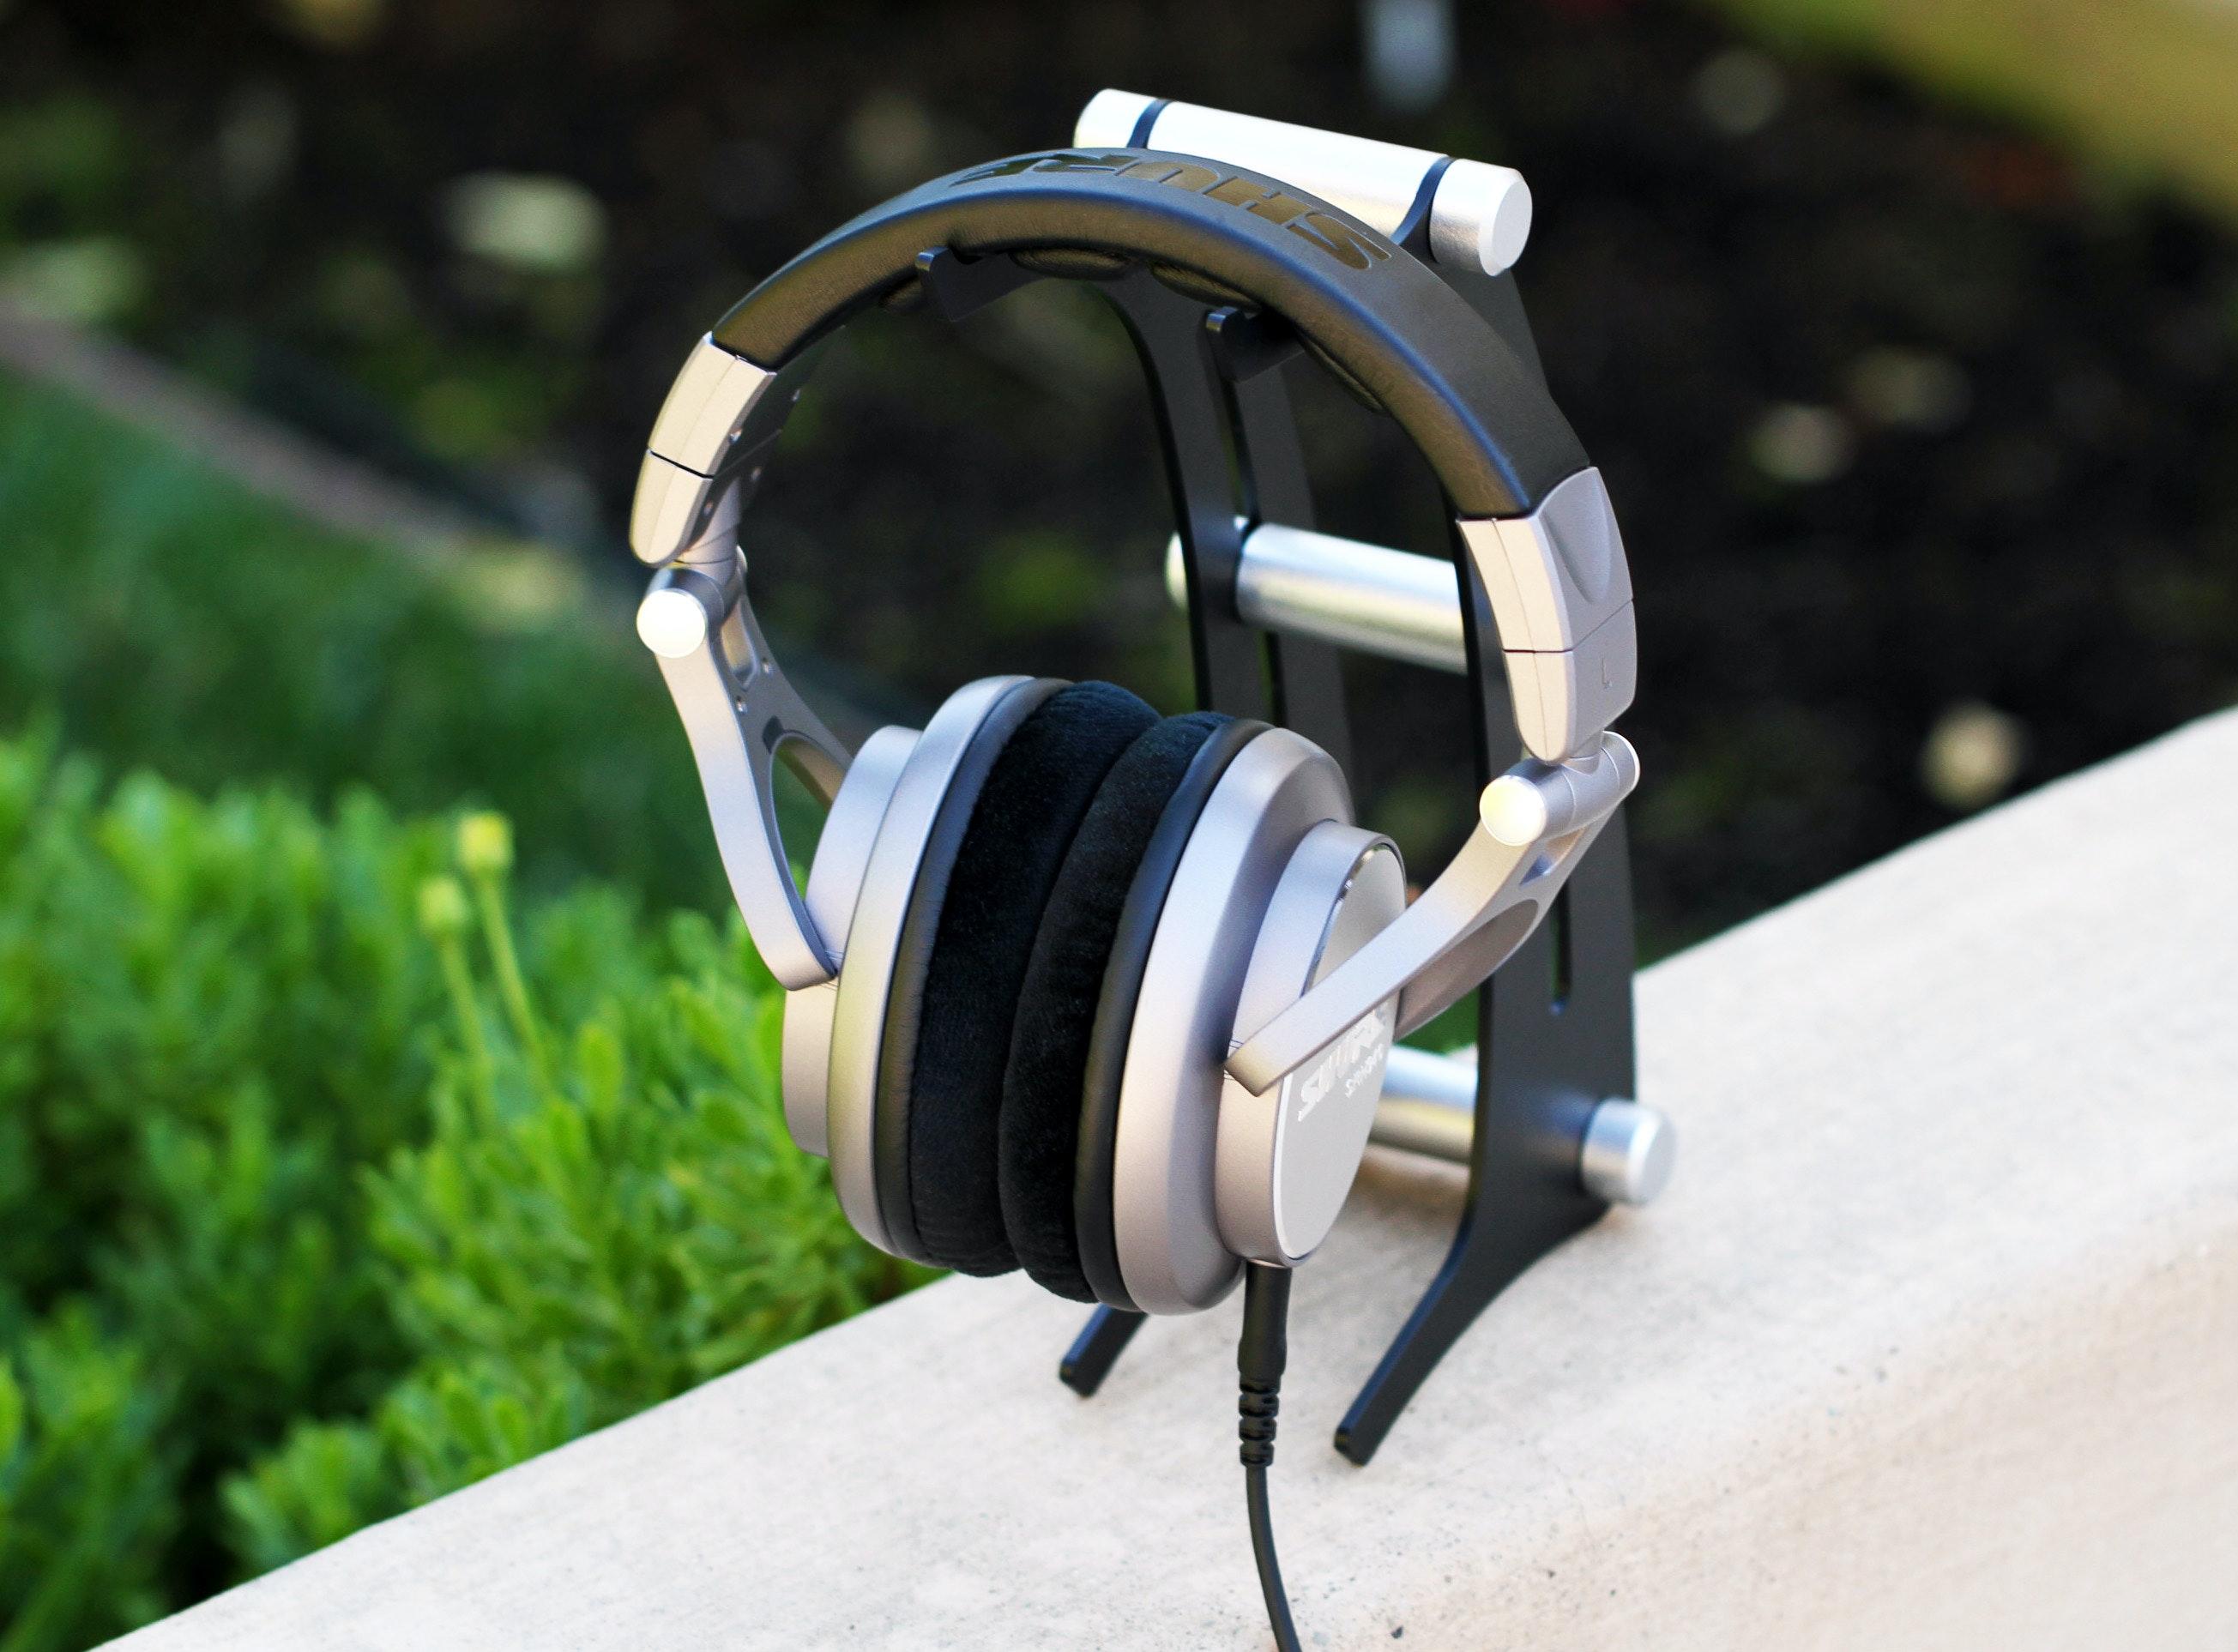 Shure SRH 940 Audiophile Headphone